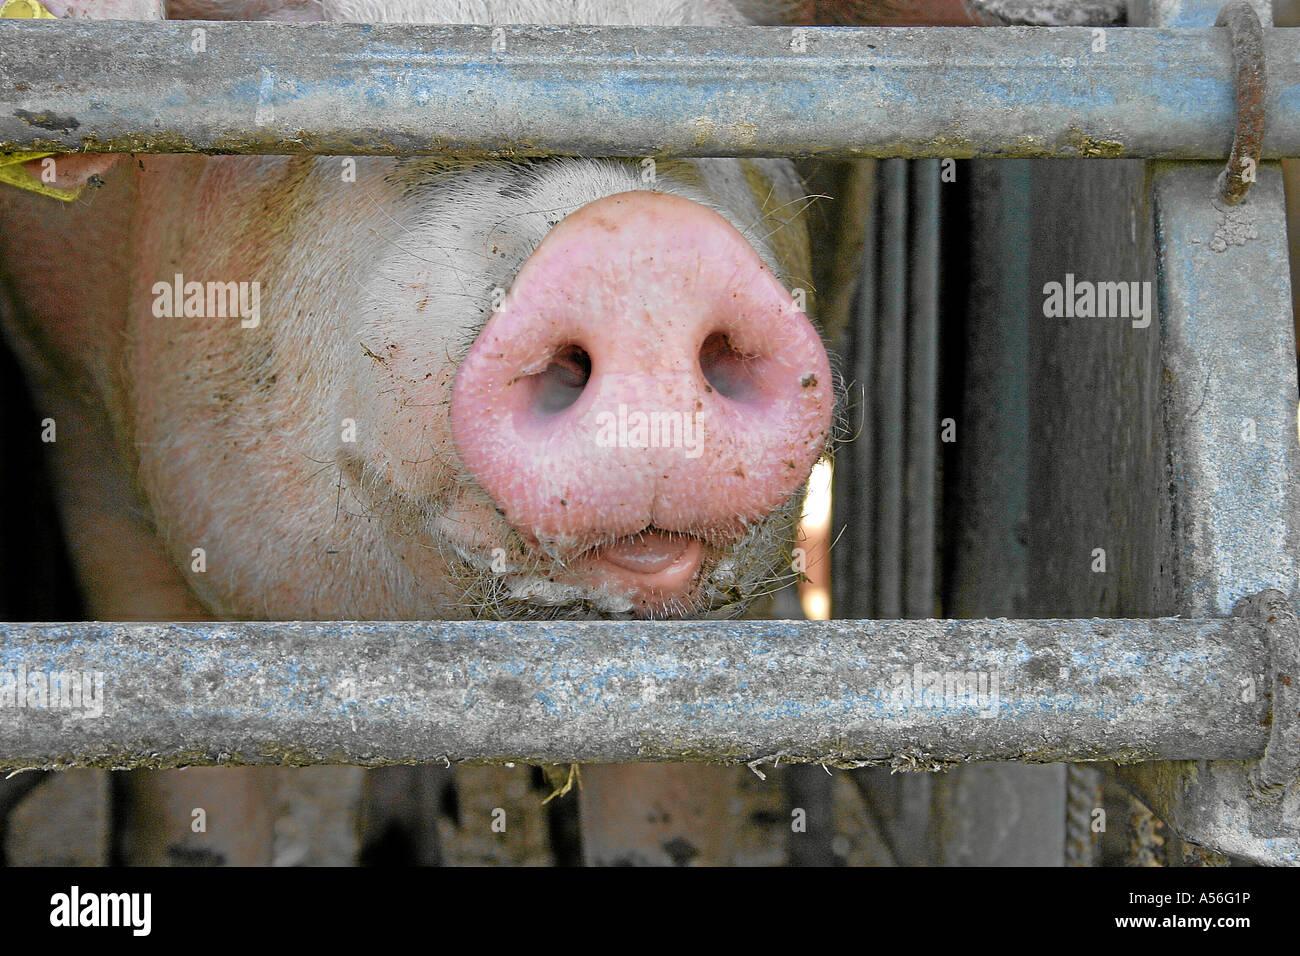 Mastschwein im Stall Stock Photo